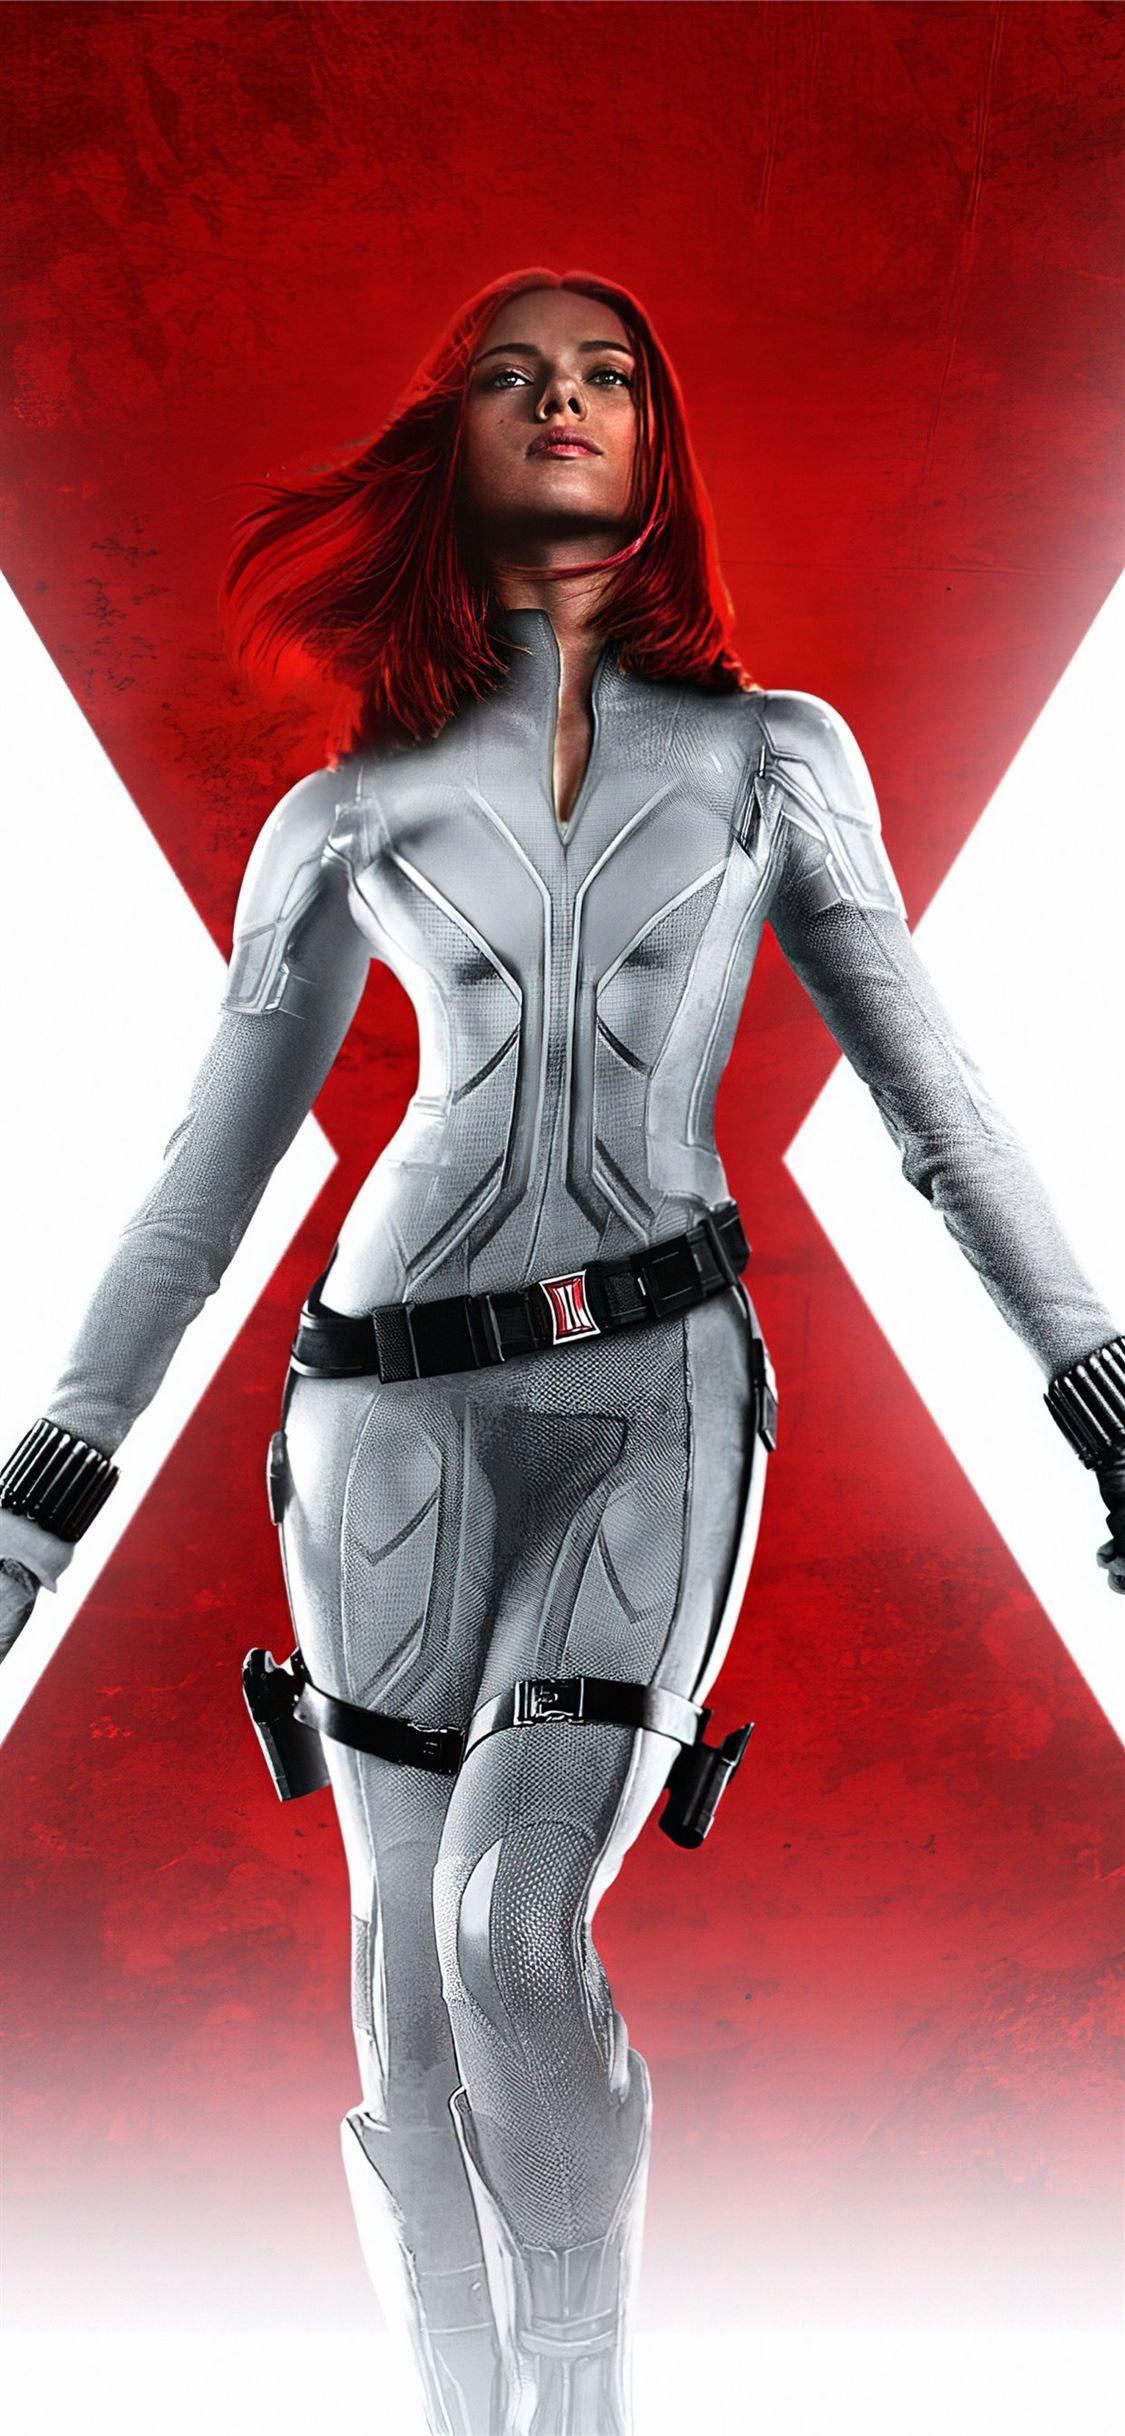 4k Black Widow 2020 Blackwidow Movies 2020movies 4k Marvel Iphone11wallpaper Black Widow Marvel Black Widow Wallpaper Black Widow 2020